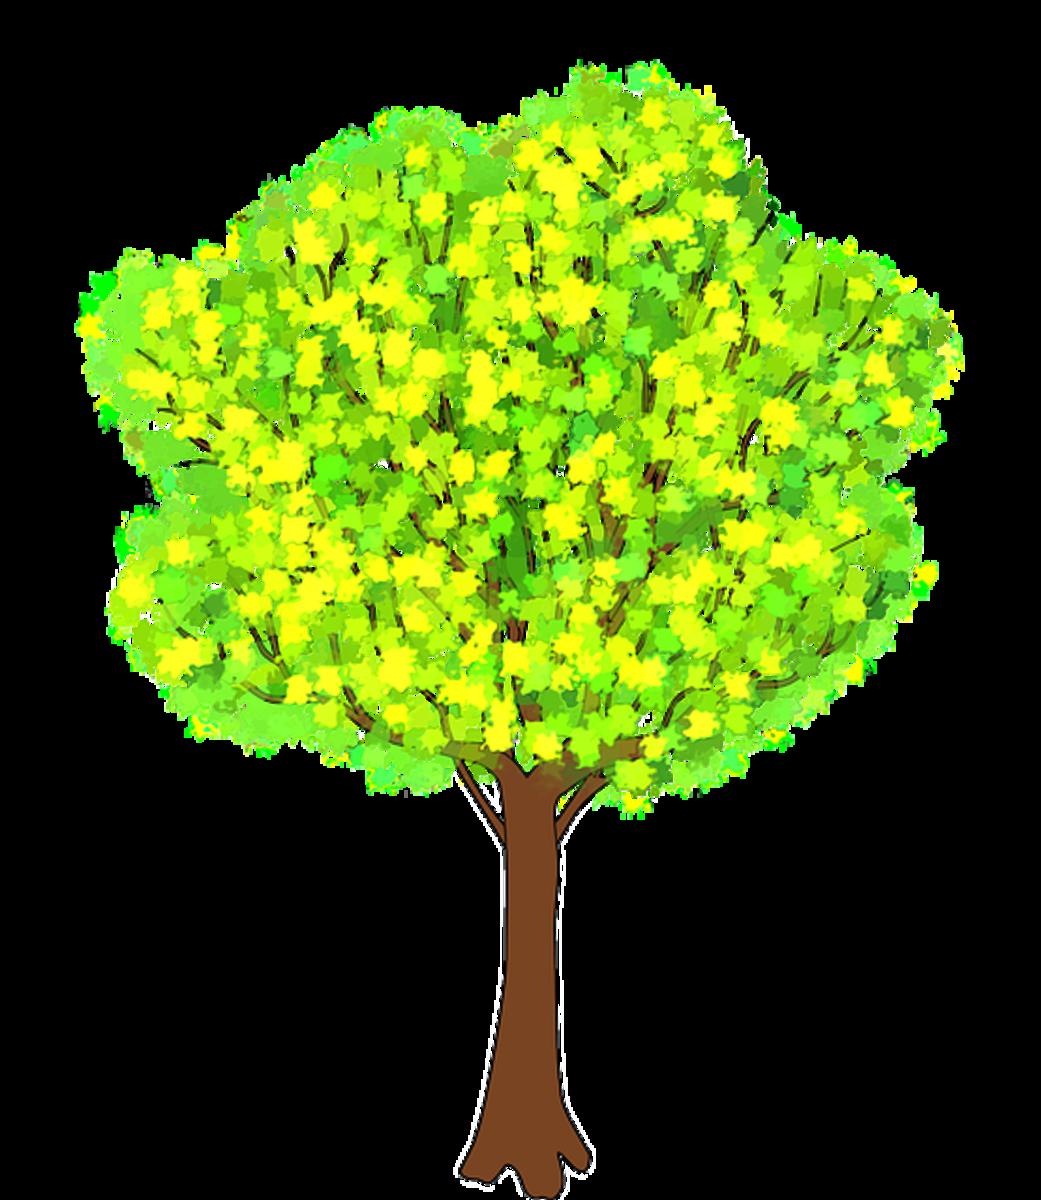 flowering tree clipart - photo #15